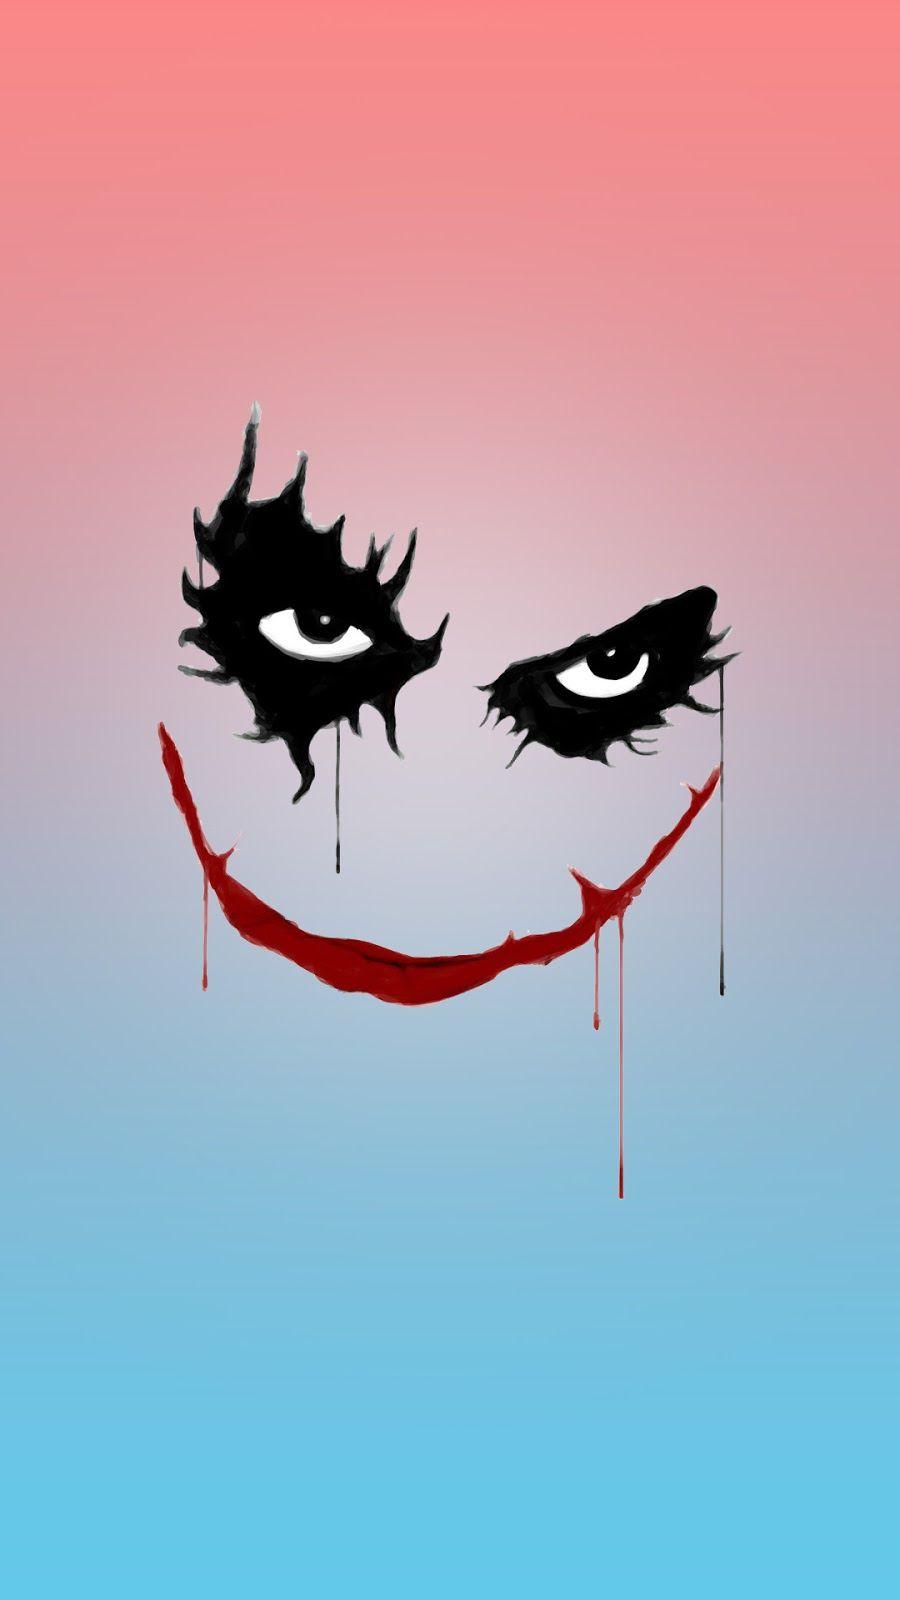 Joker Wallpaper Iphone 6s Plus Jpg 900 1600 Joker Iphone Wallpaper Joker Wallpapers Batman Joker Wallpaper